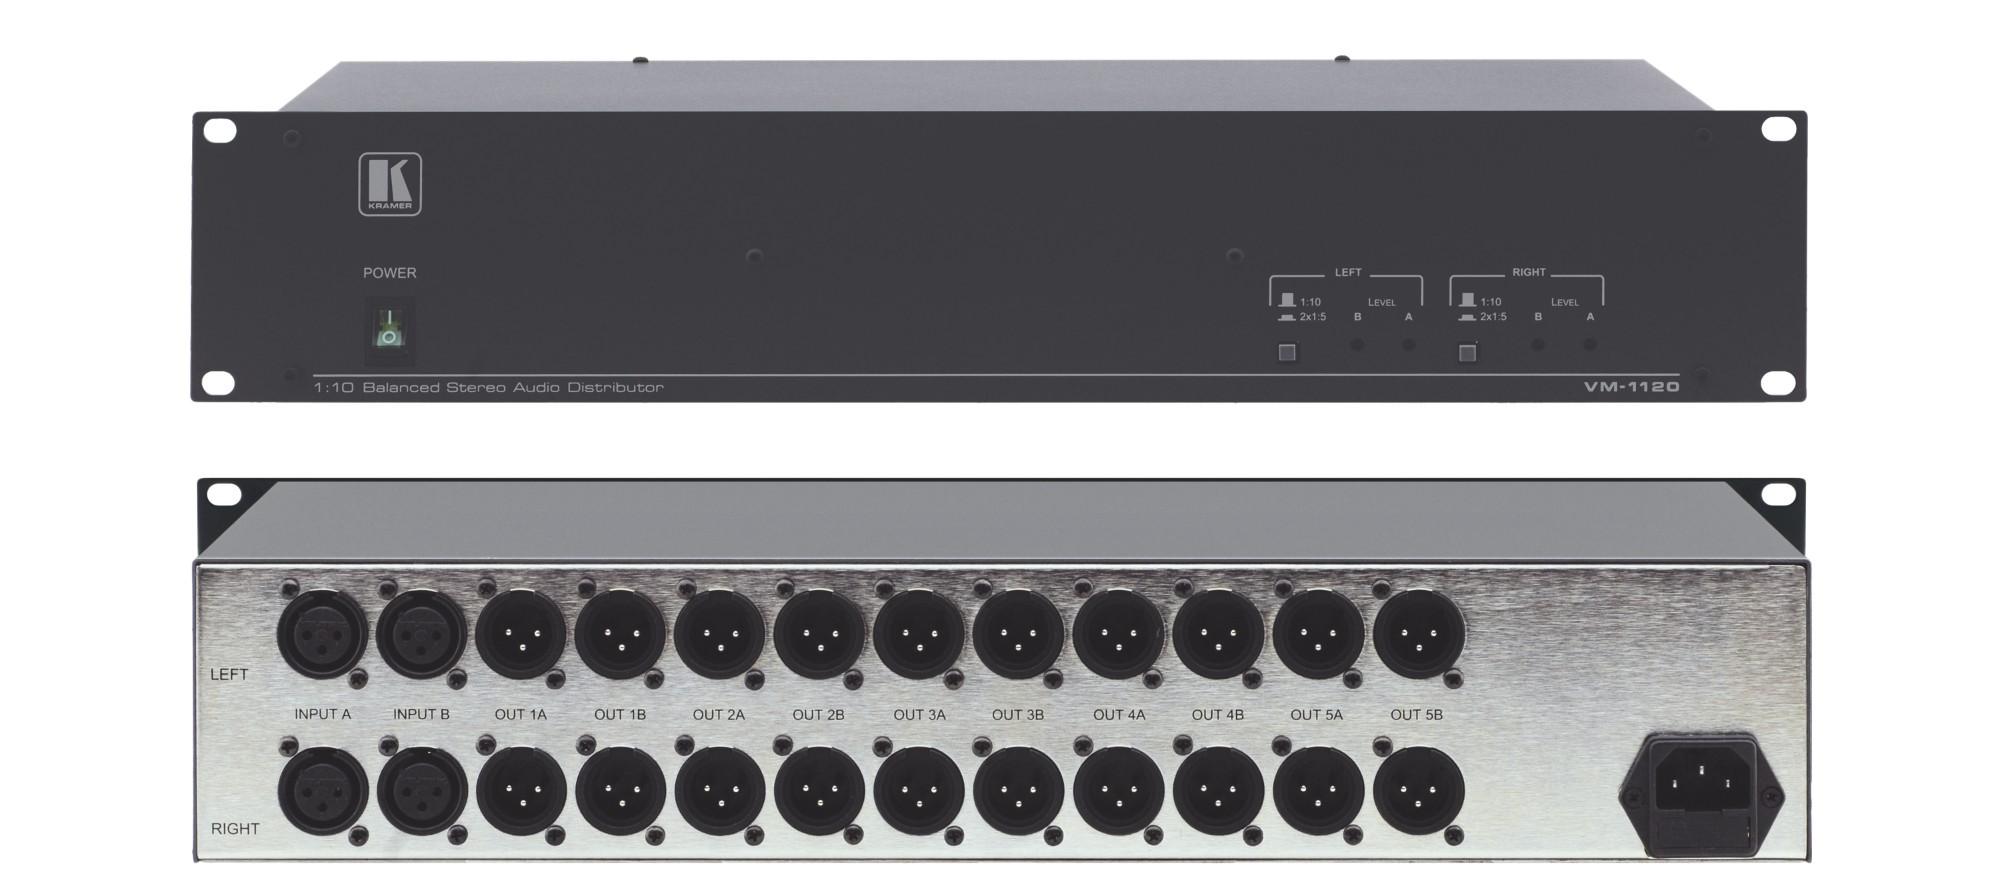 Kramer Electronics VM-1120 Wired Grey audio amplifier